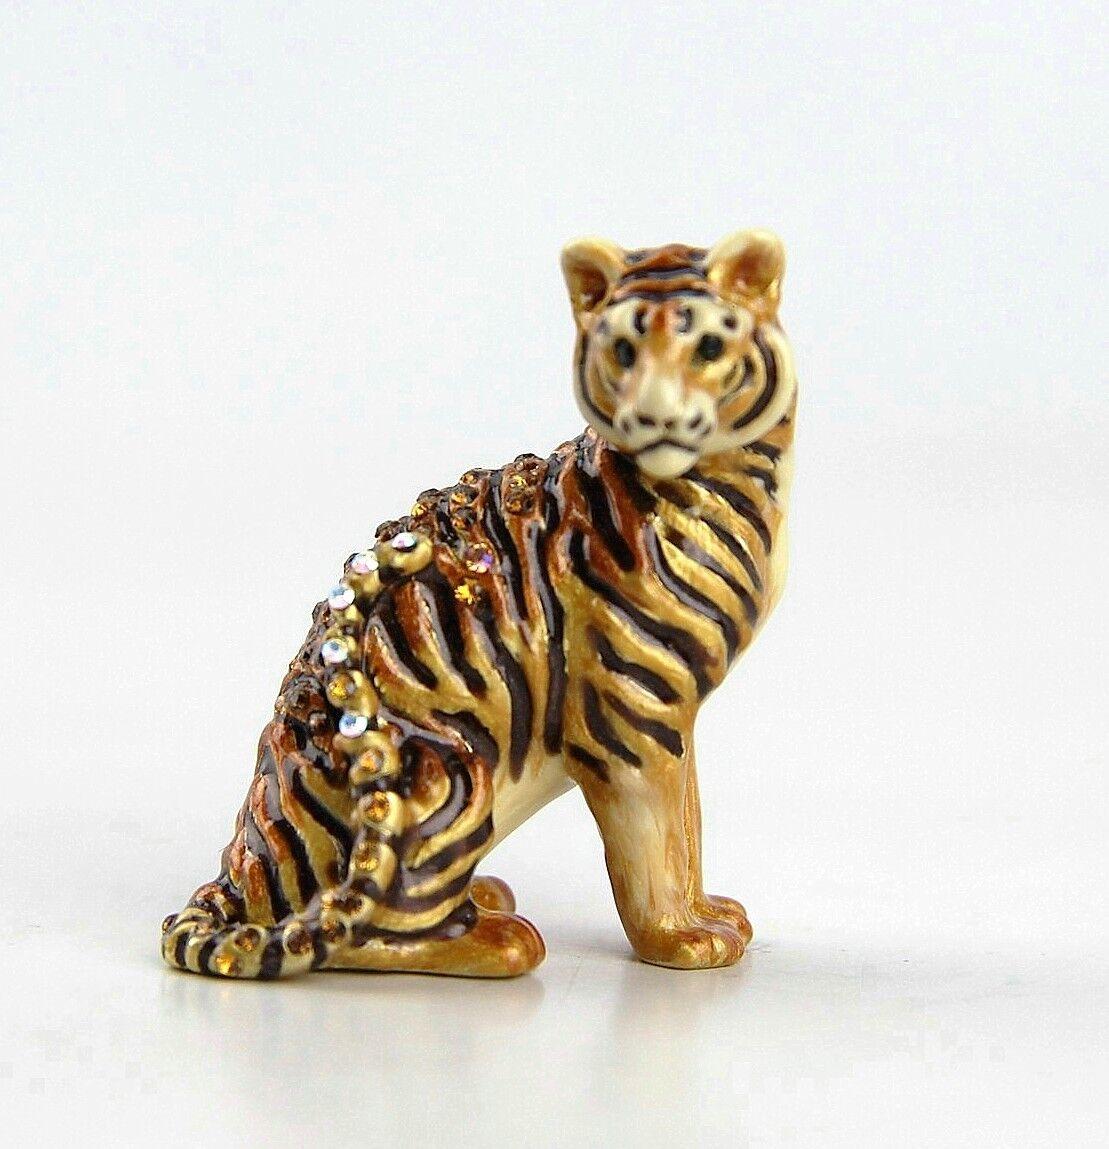 Jay Strongwater selva Anthony Tiger Mini Estatuilla cristales de Swarovski Nuevo Caja